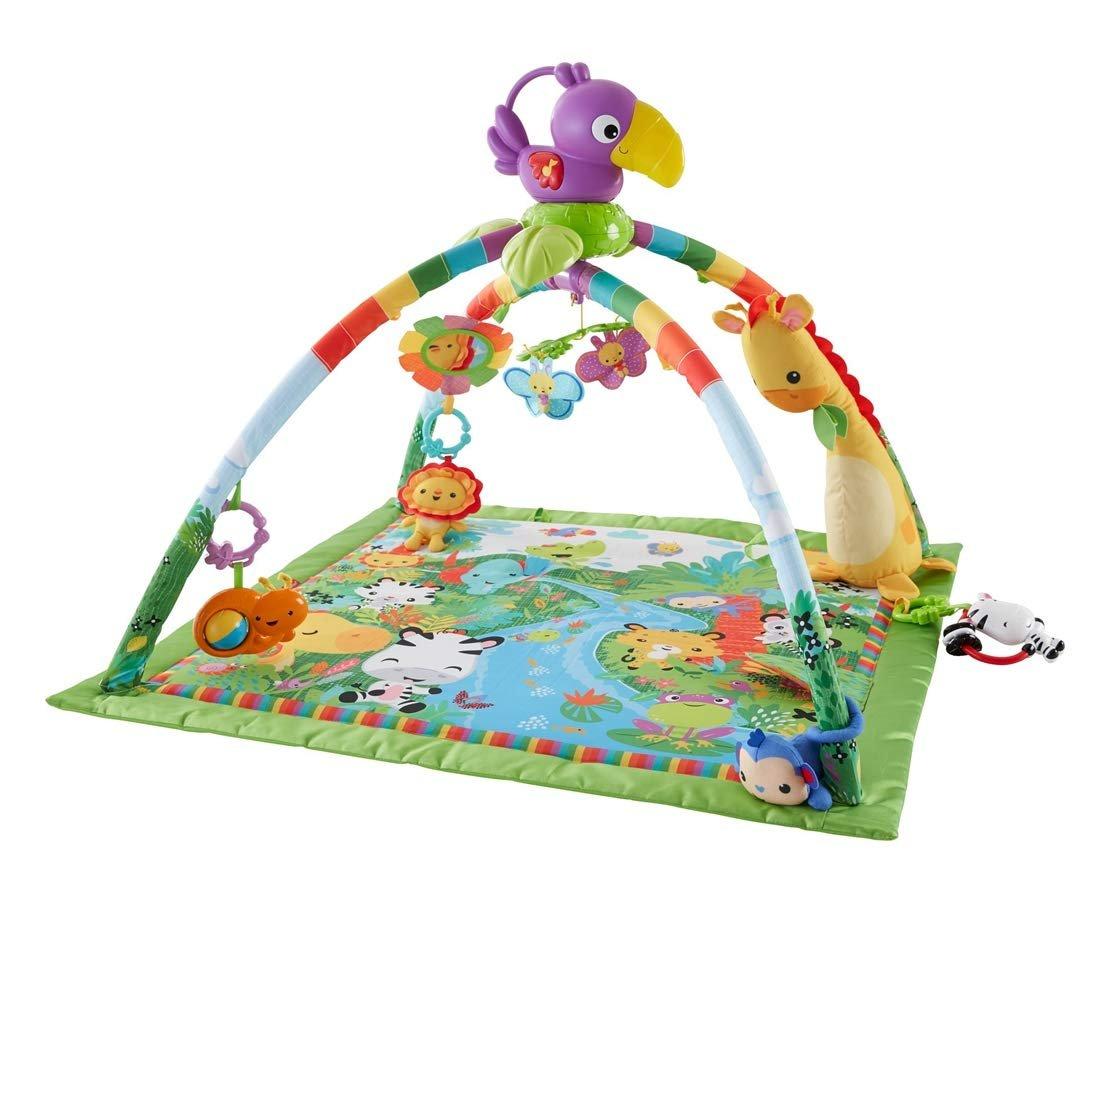 Fisher-Price DFP08 Rainforest Gym, Baby Playmat